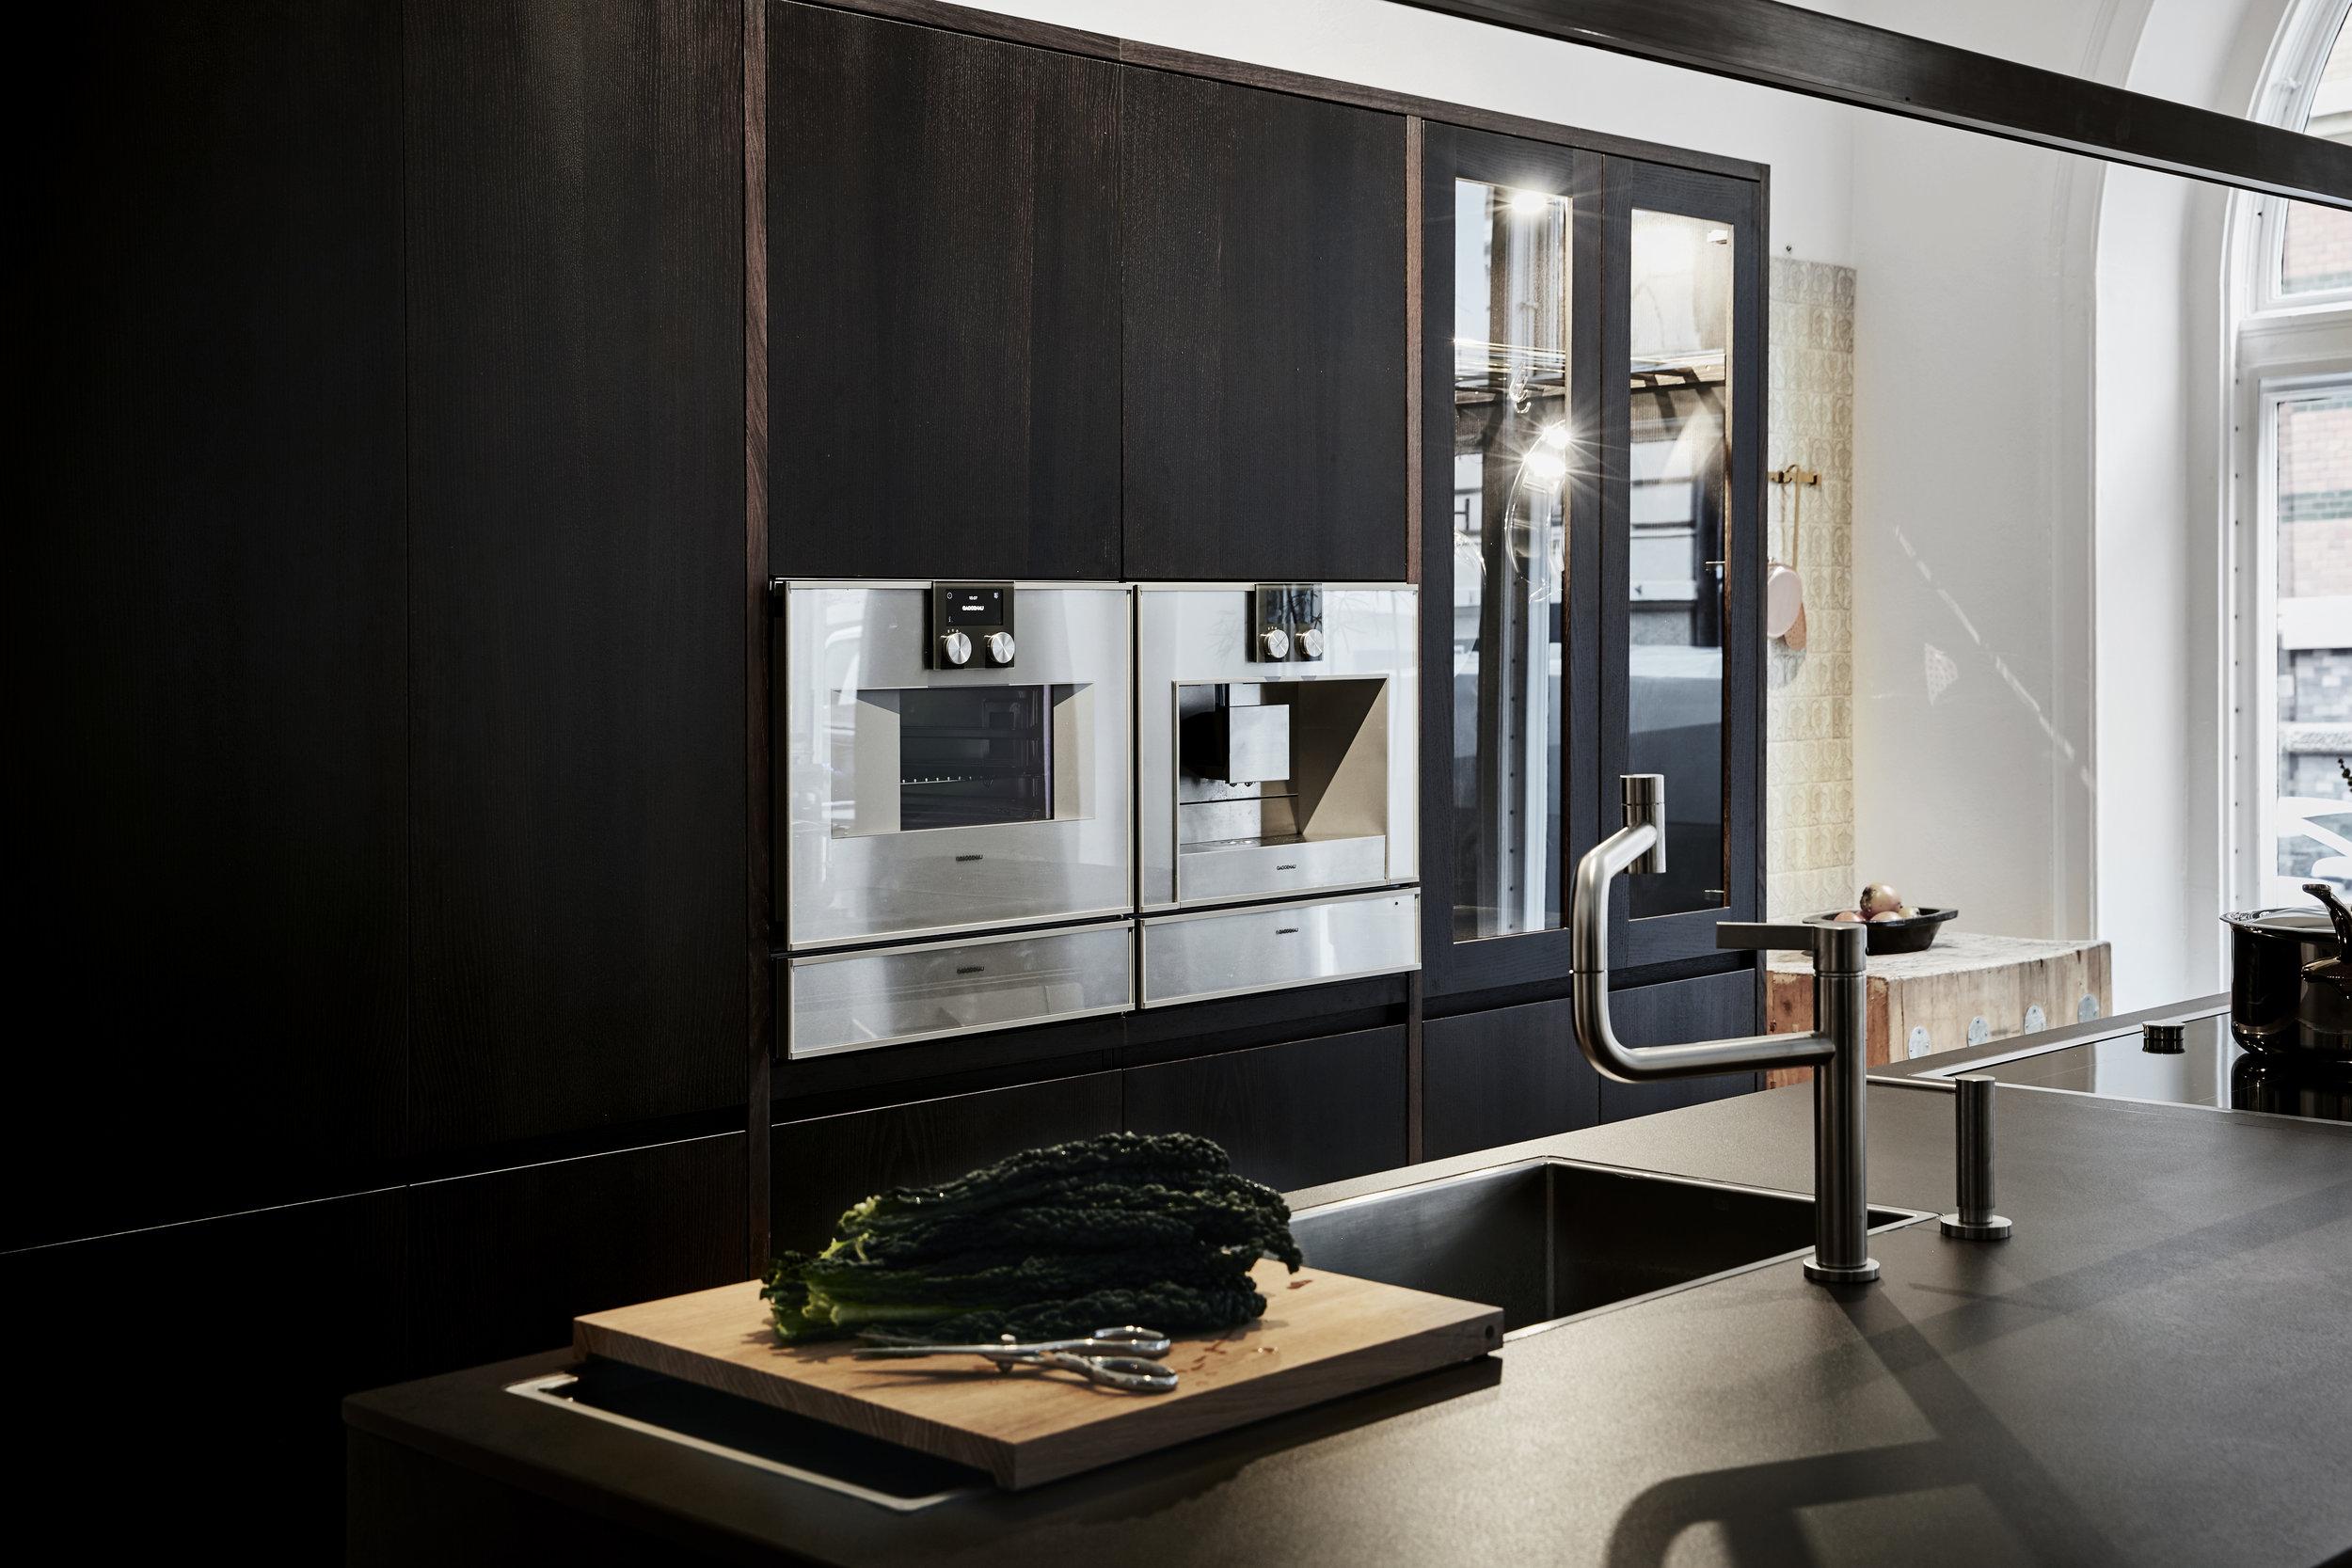 Kitchen and beyond-31.jpg